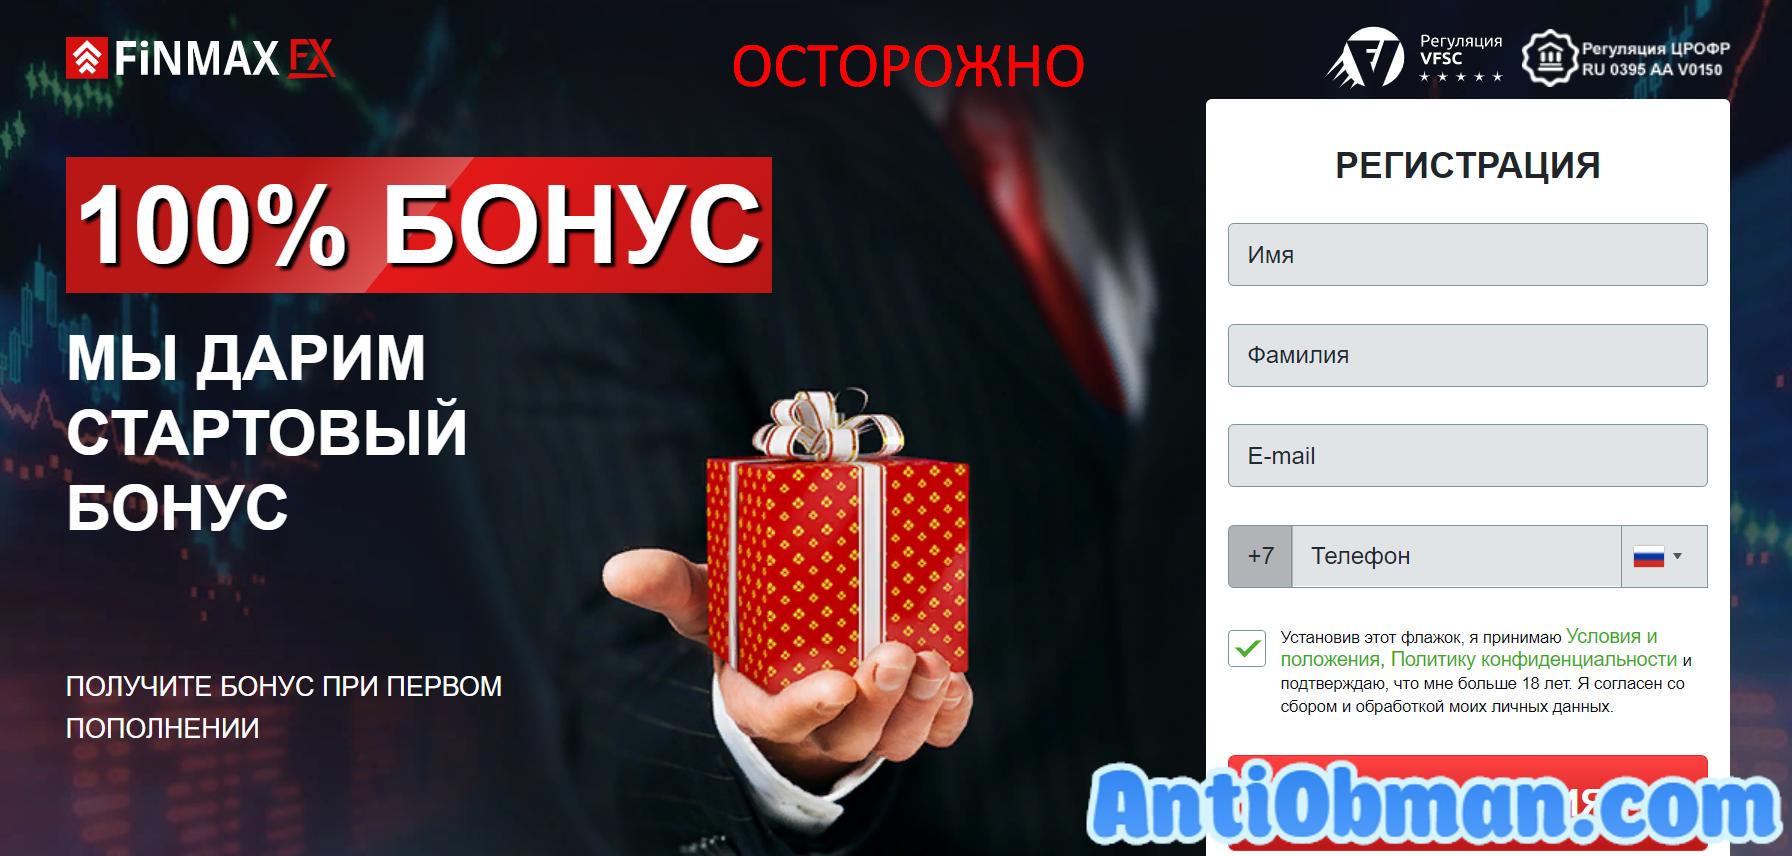 Anna-otzyvy.ru - отзывы о сайте Крыловой Анны